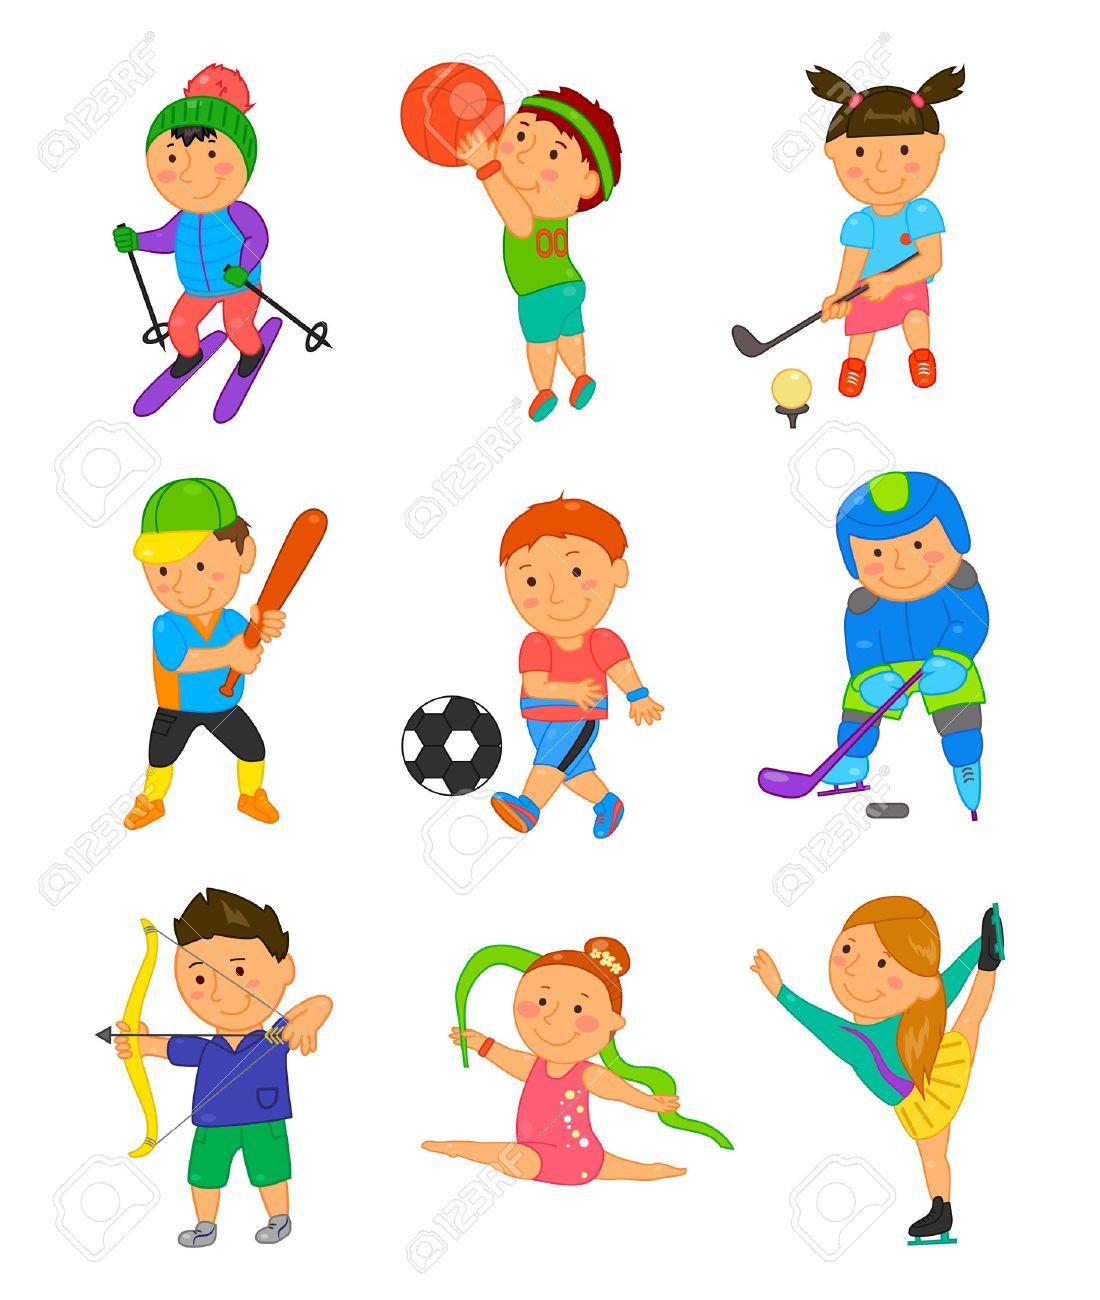 Cartoon Sport Kids Vector Illustration For Children Game Design Royalty Free Cliparts Vectors And Stock Illustration Image 60178602